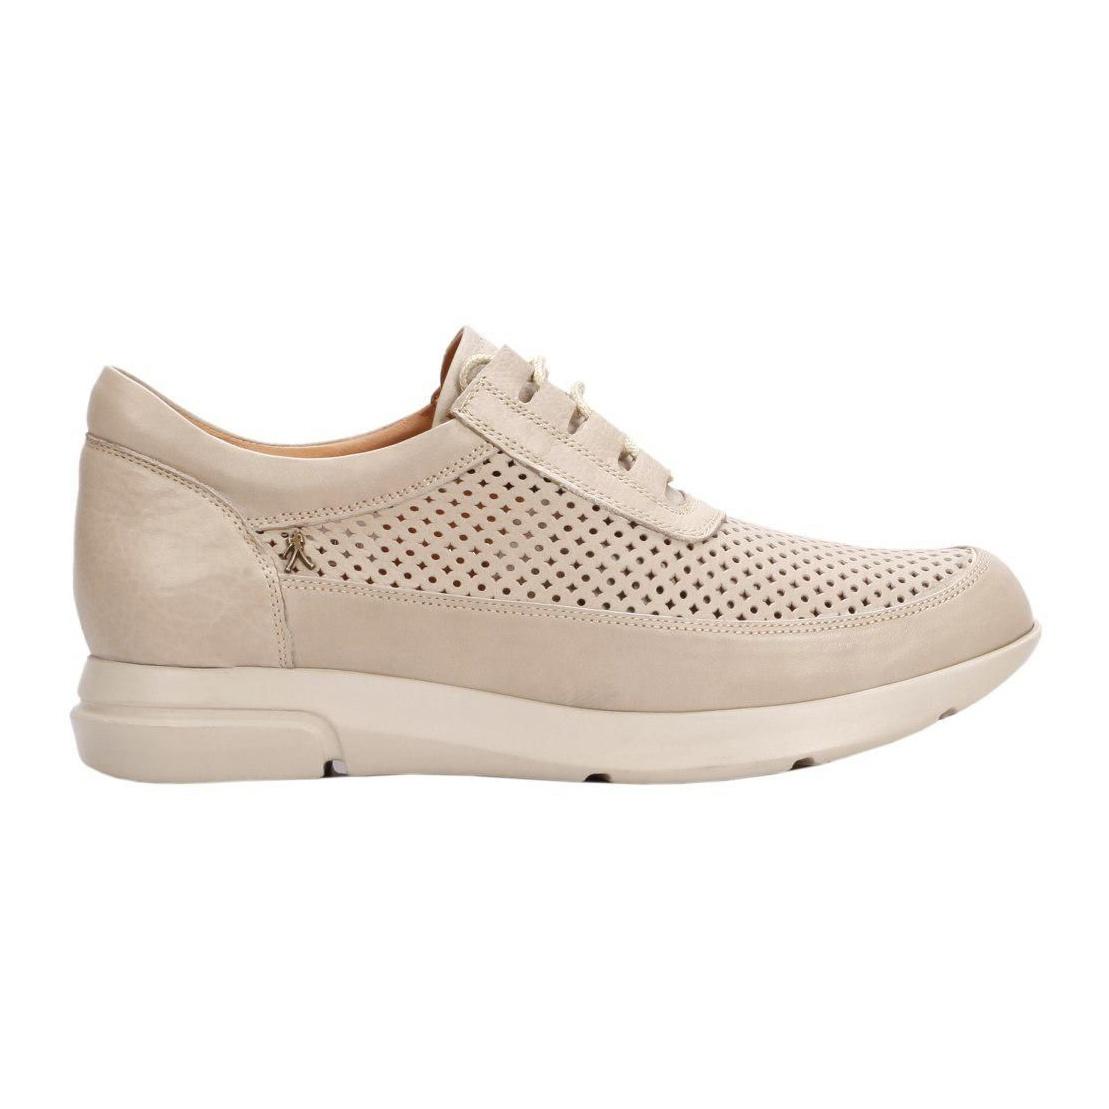 کفش روزمره زنانه نیکلاس کد 2 3 7 - C